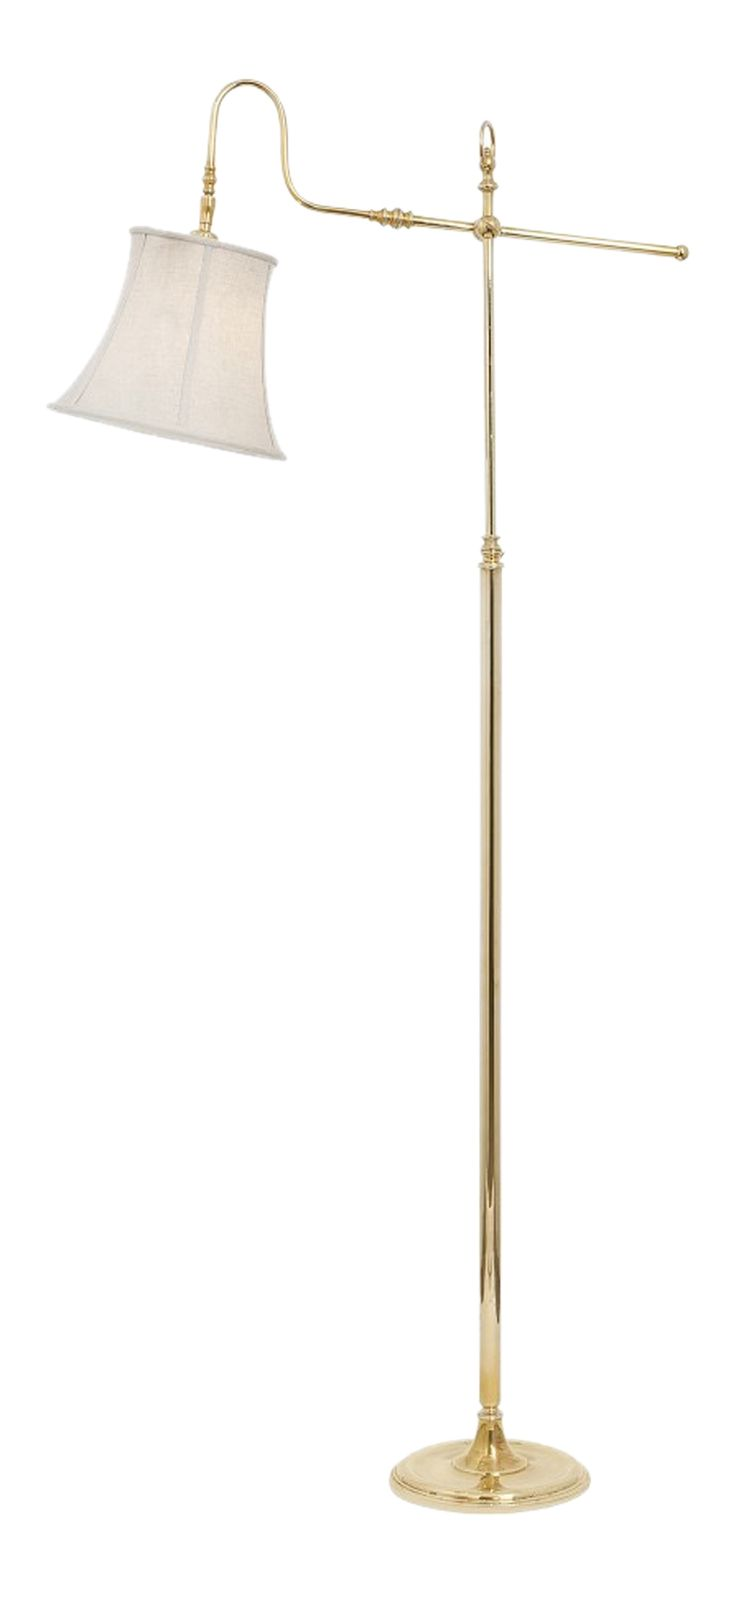 Morris Floor Lamp  - Transitional Floor Lamps - Dering Hall